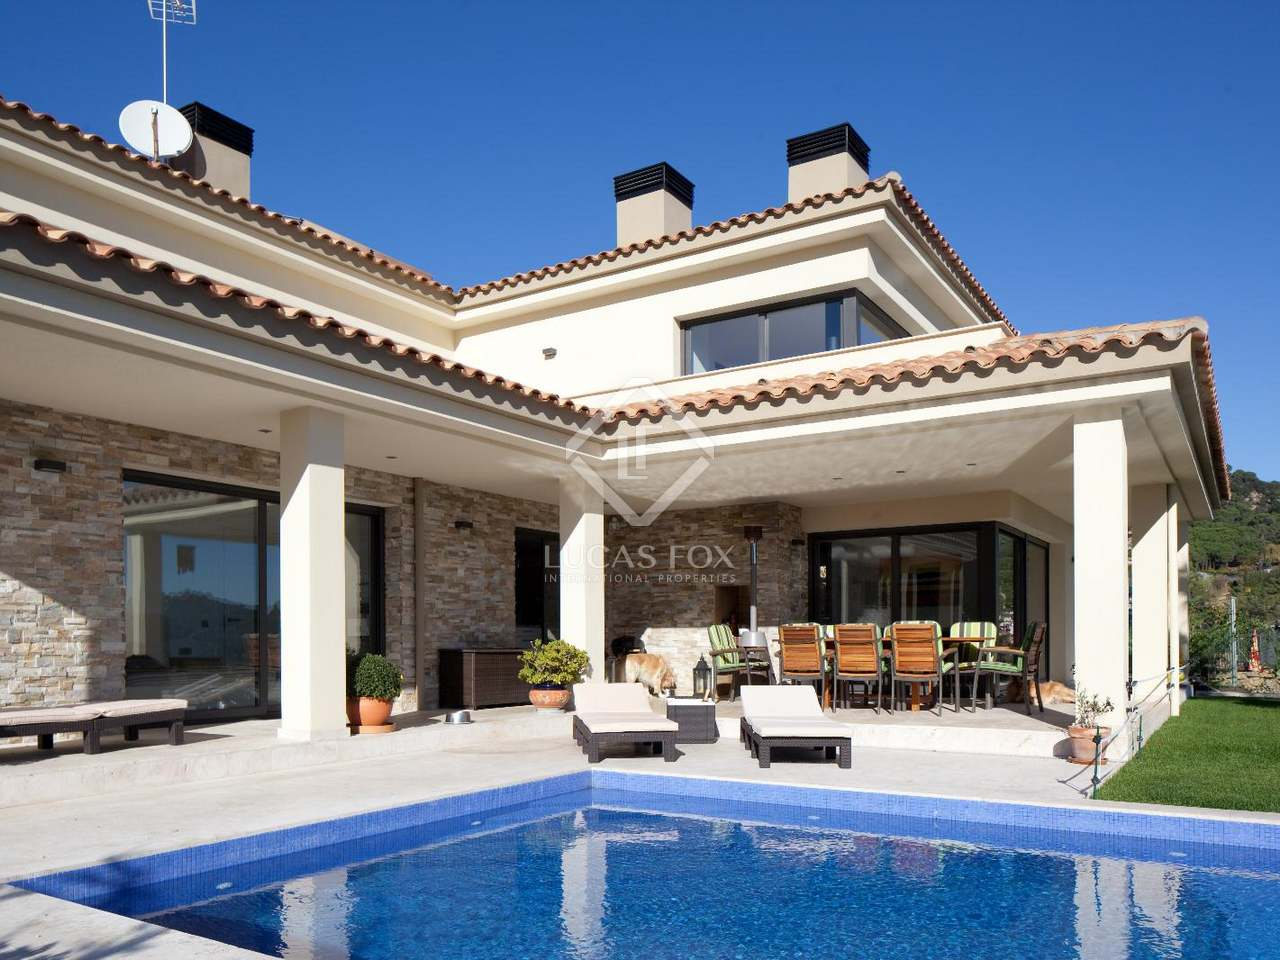 Se vende casa lujosa en lloret de mar costa brava for Cama lujosa